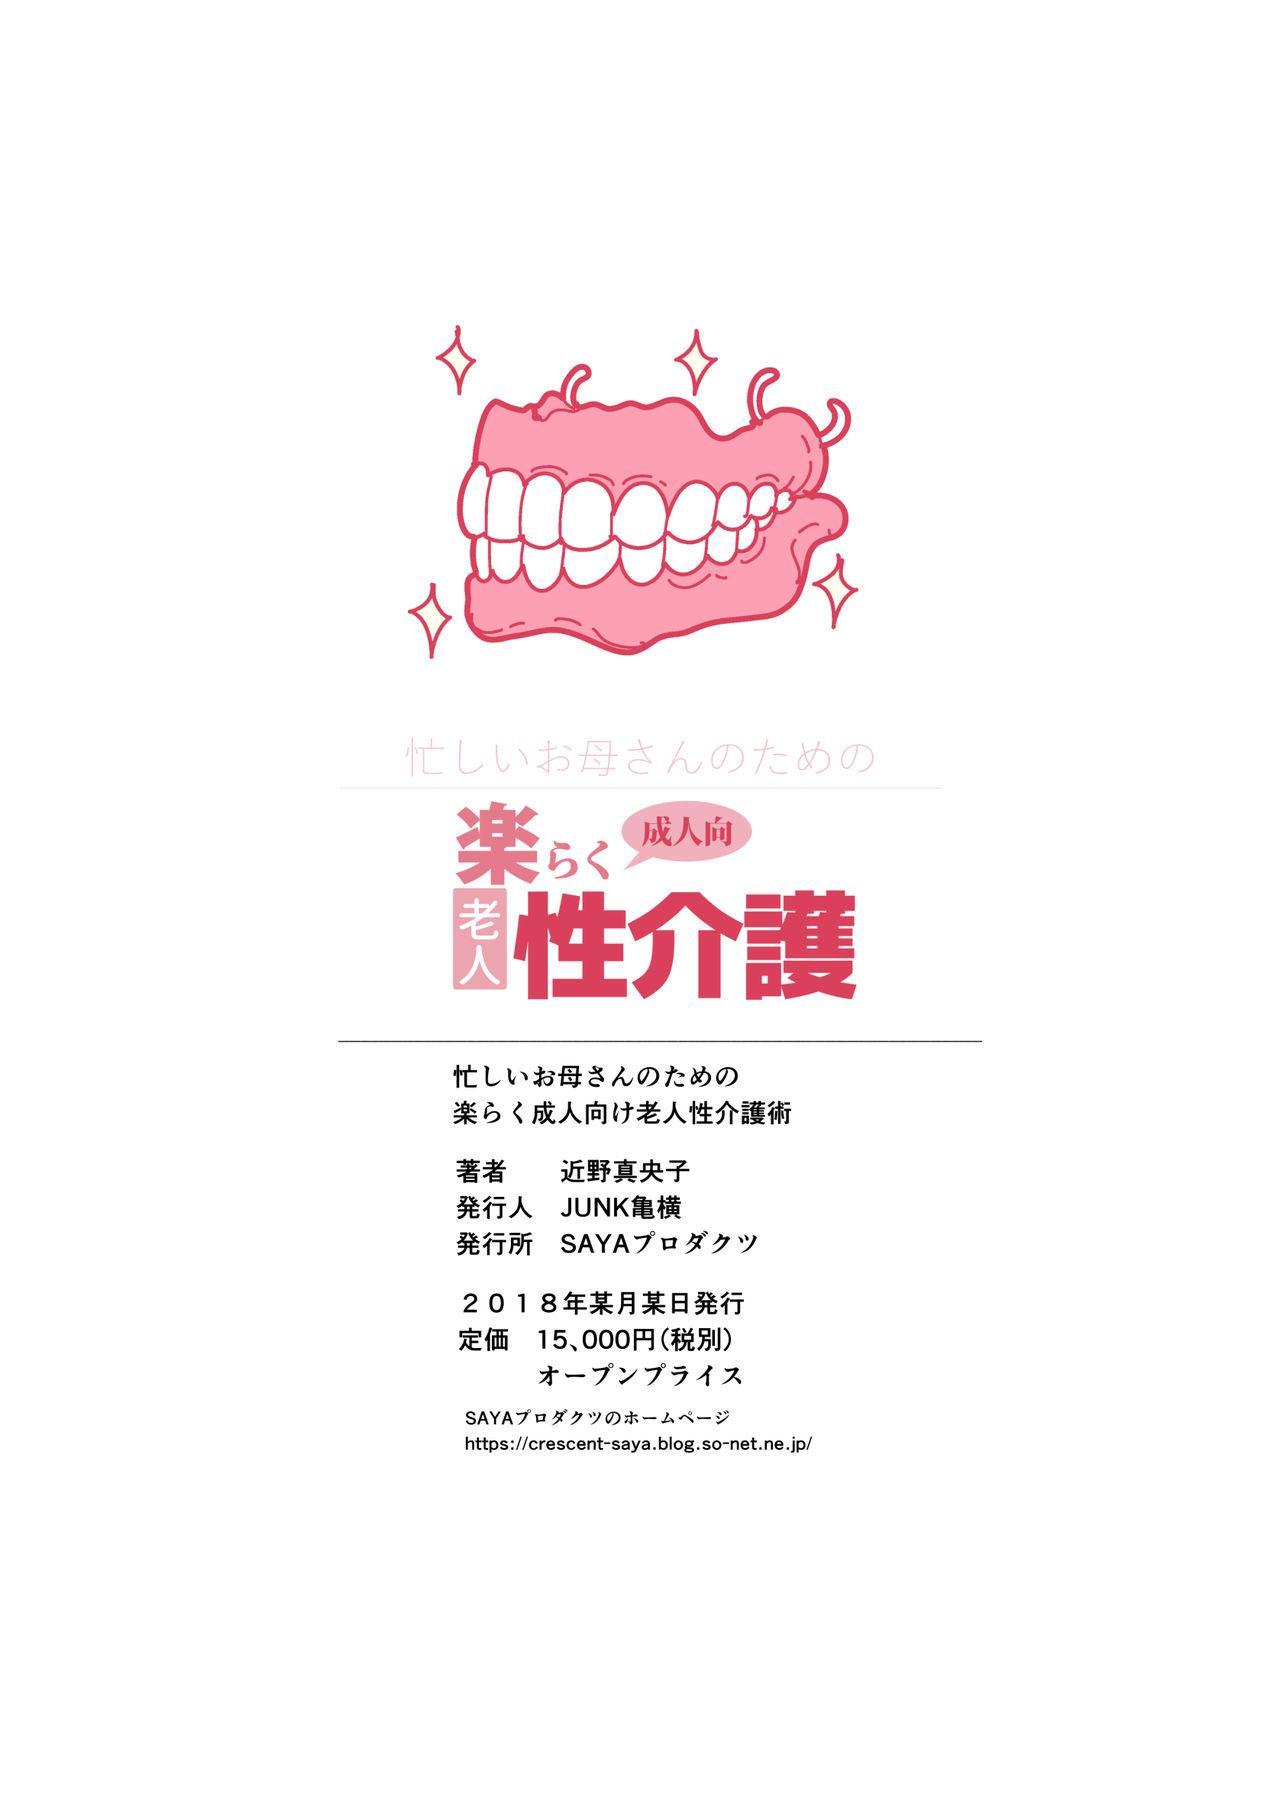 Isogasii Okaasan No Tamuno Sasa Rouzin Seikaigo | Guide for Elderly Sex Health Care to Busy Mom 70